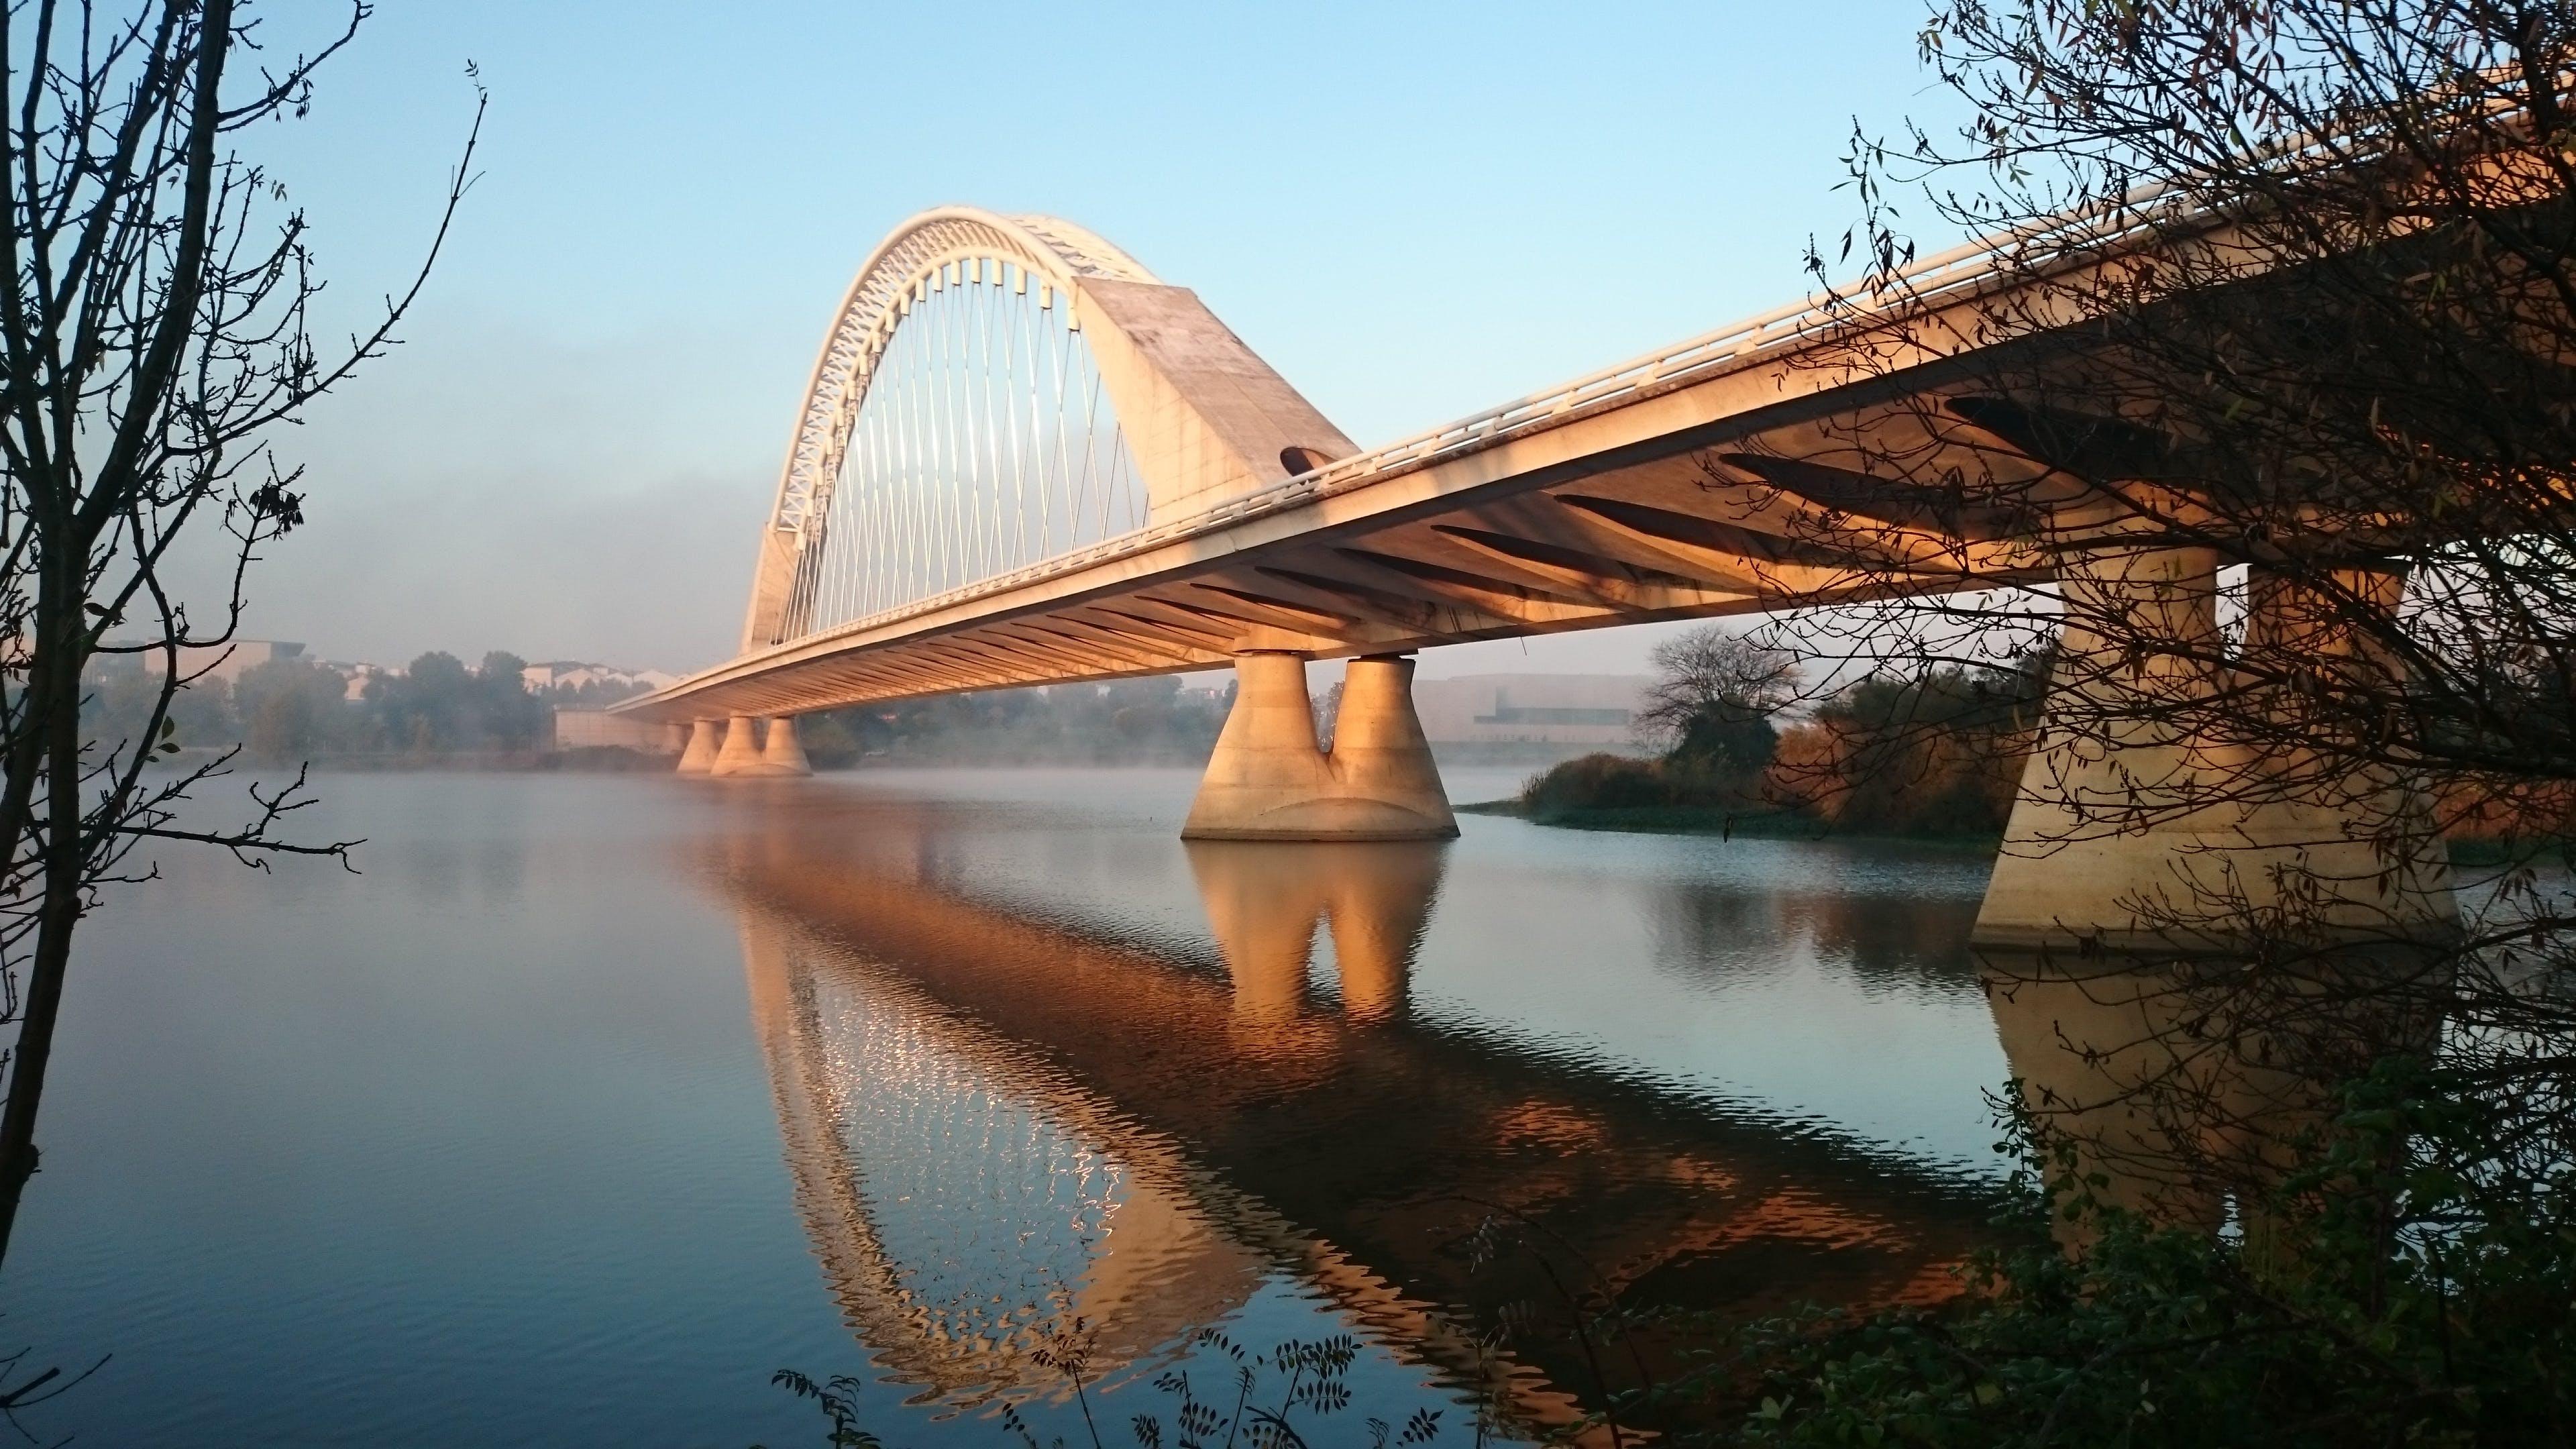 Grey Concrete Bridge Above Water Under Blue Sky